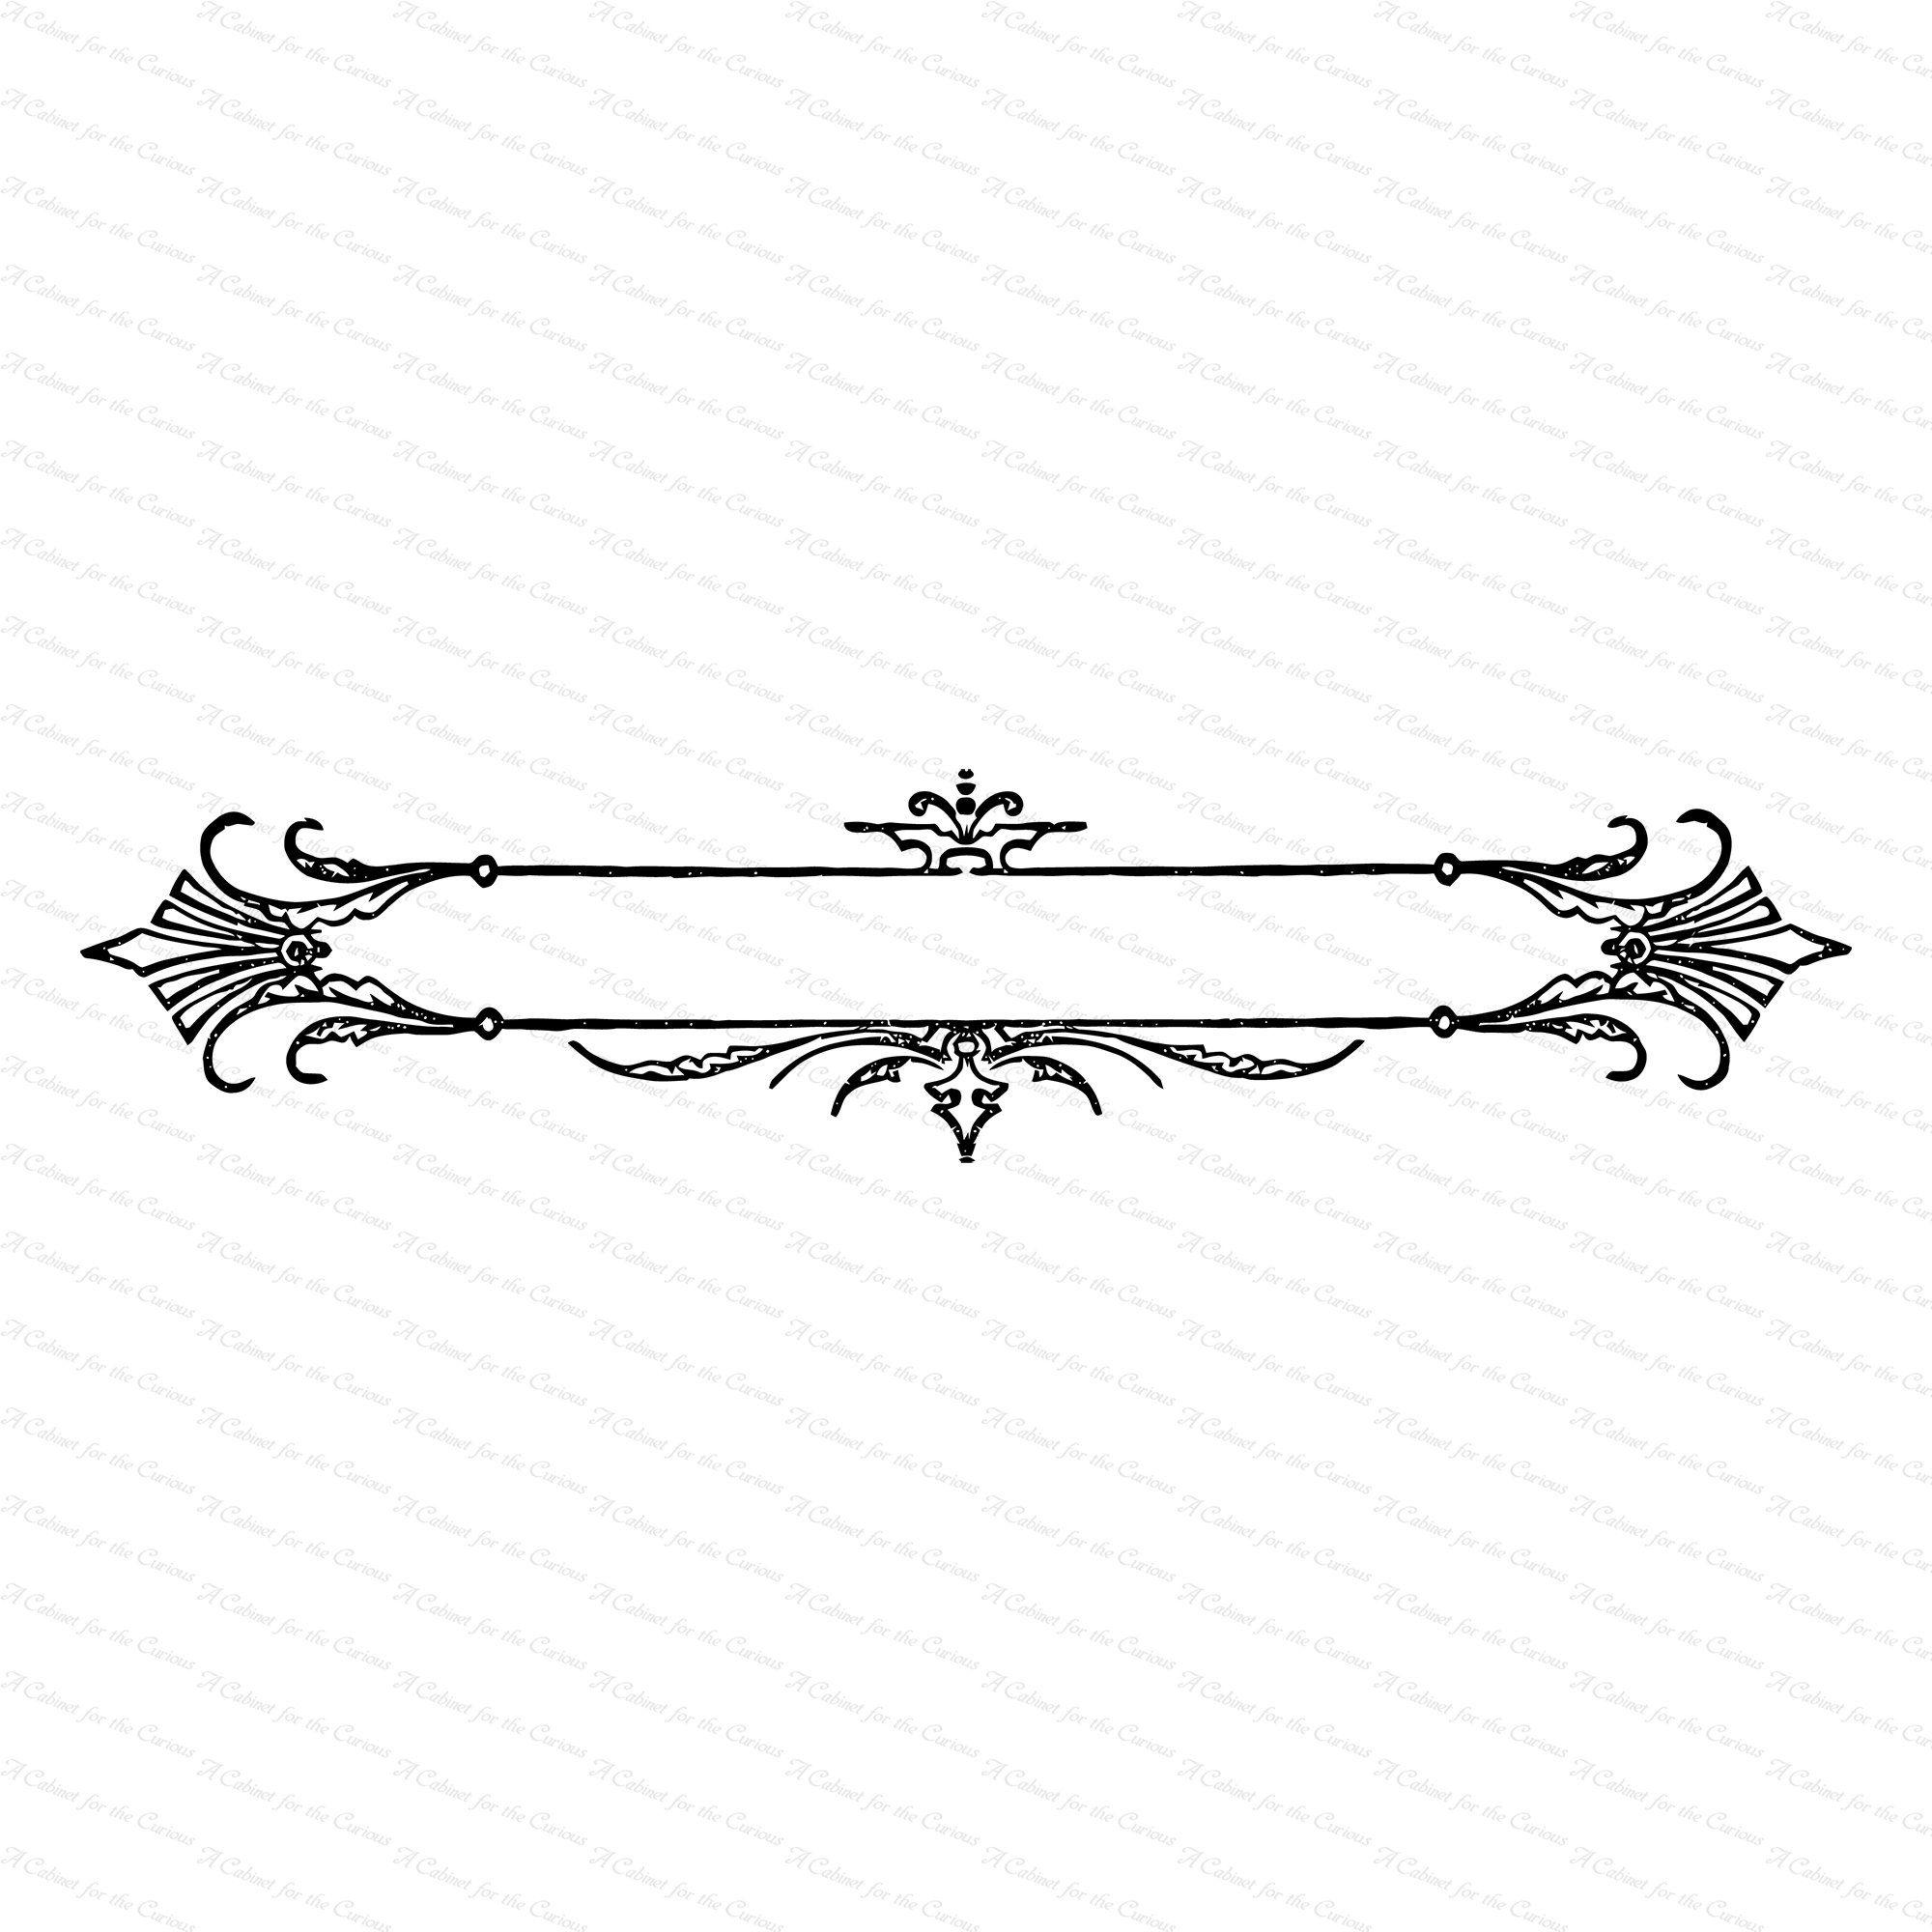 Vintage Ornate Decorative Title Border Element Antique Etsy In 2021 Clip Art Borders Lettering Fonts Monogram Backgrounds